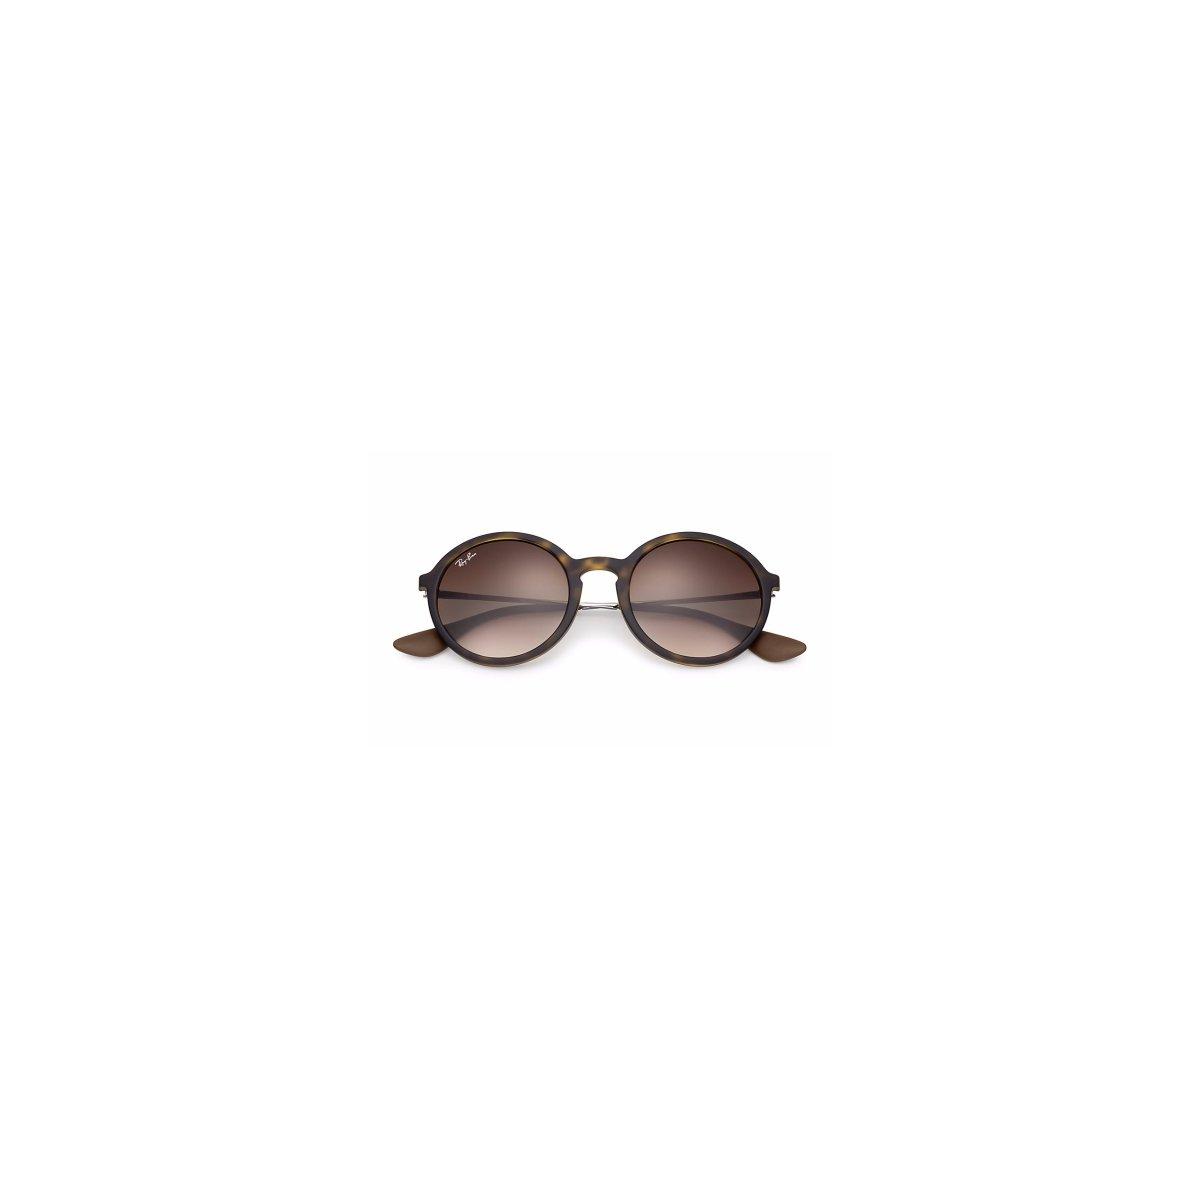 Óculos de Sol Ray Ban RB4222 Round Youngster - Compre Agora   Netshoes b468b7c9cb